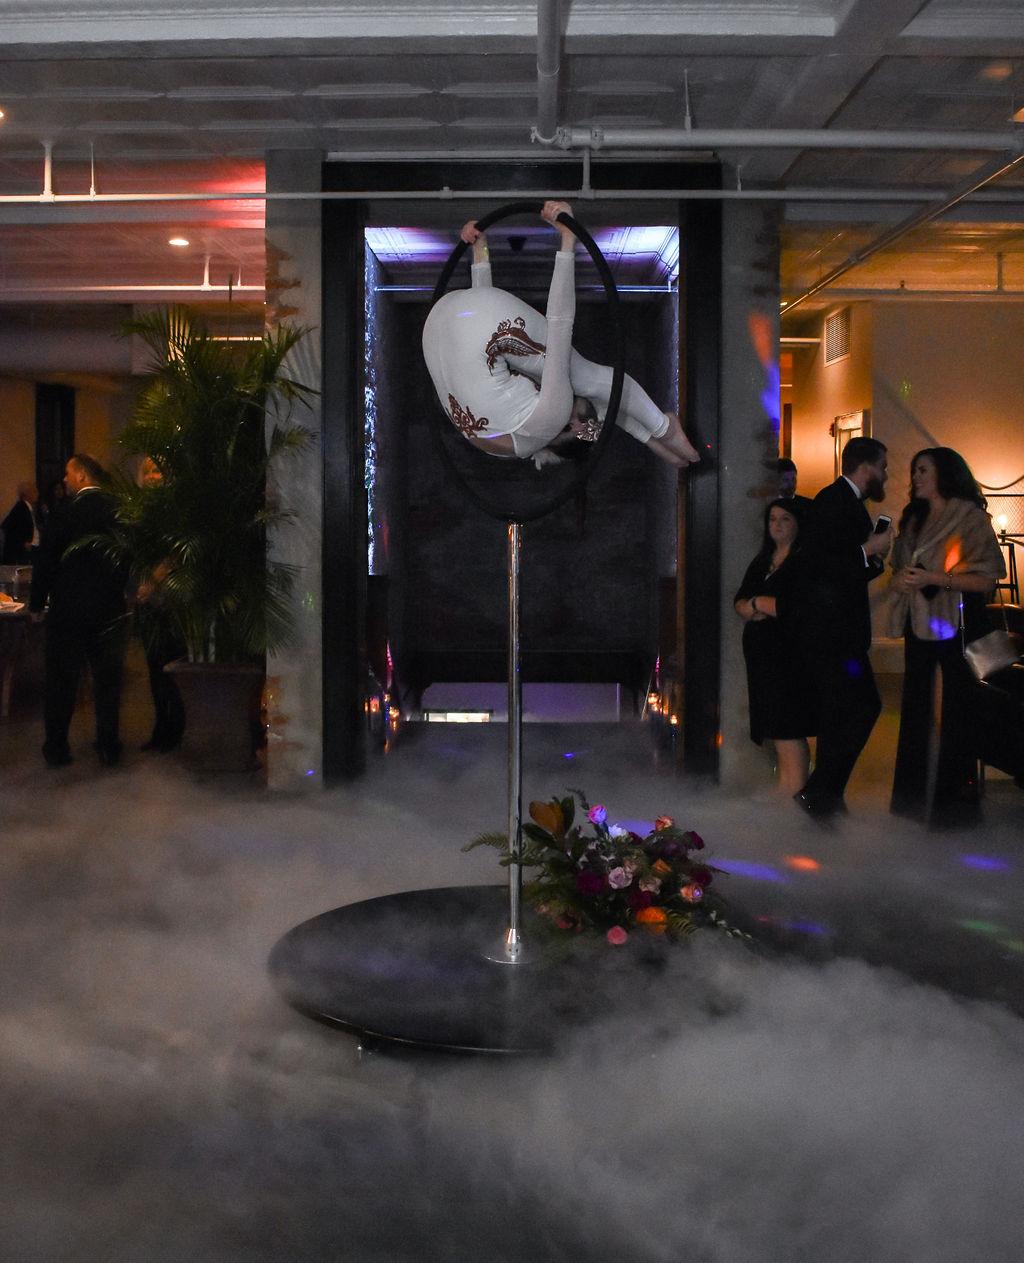 acrobat-performer-NYE-party